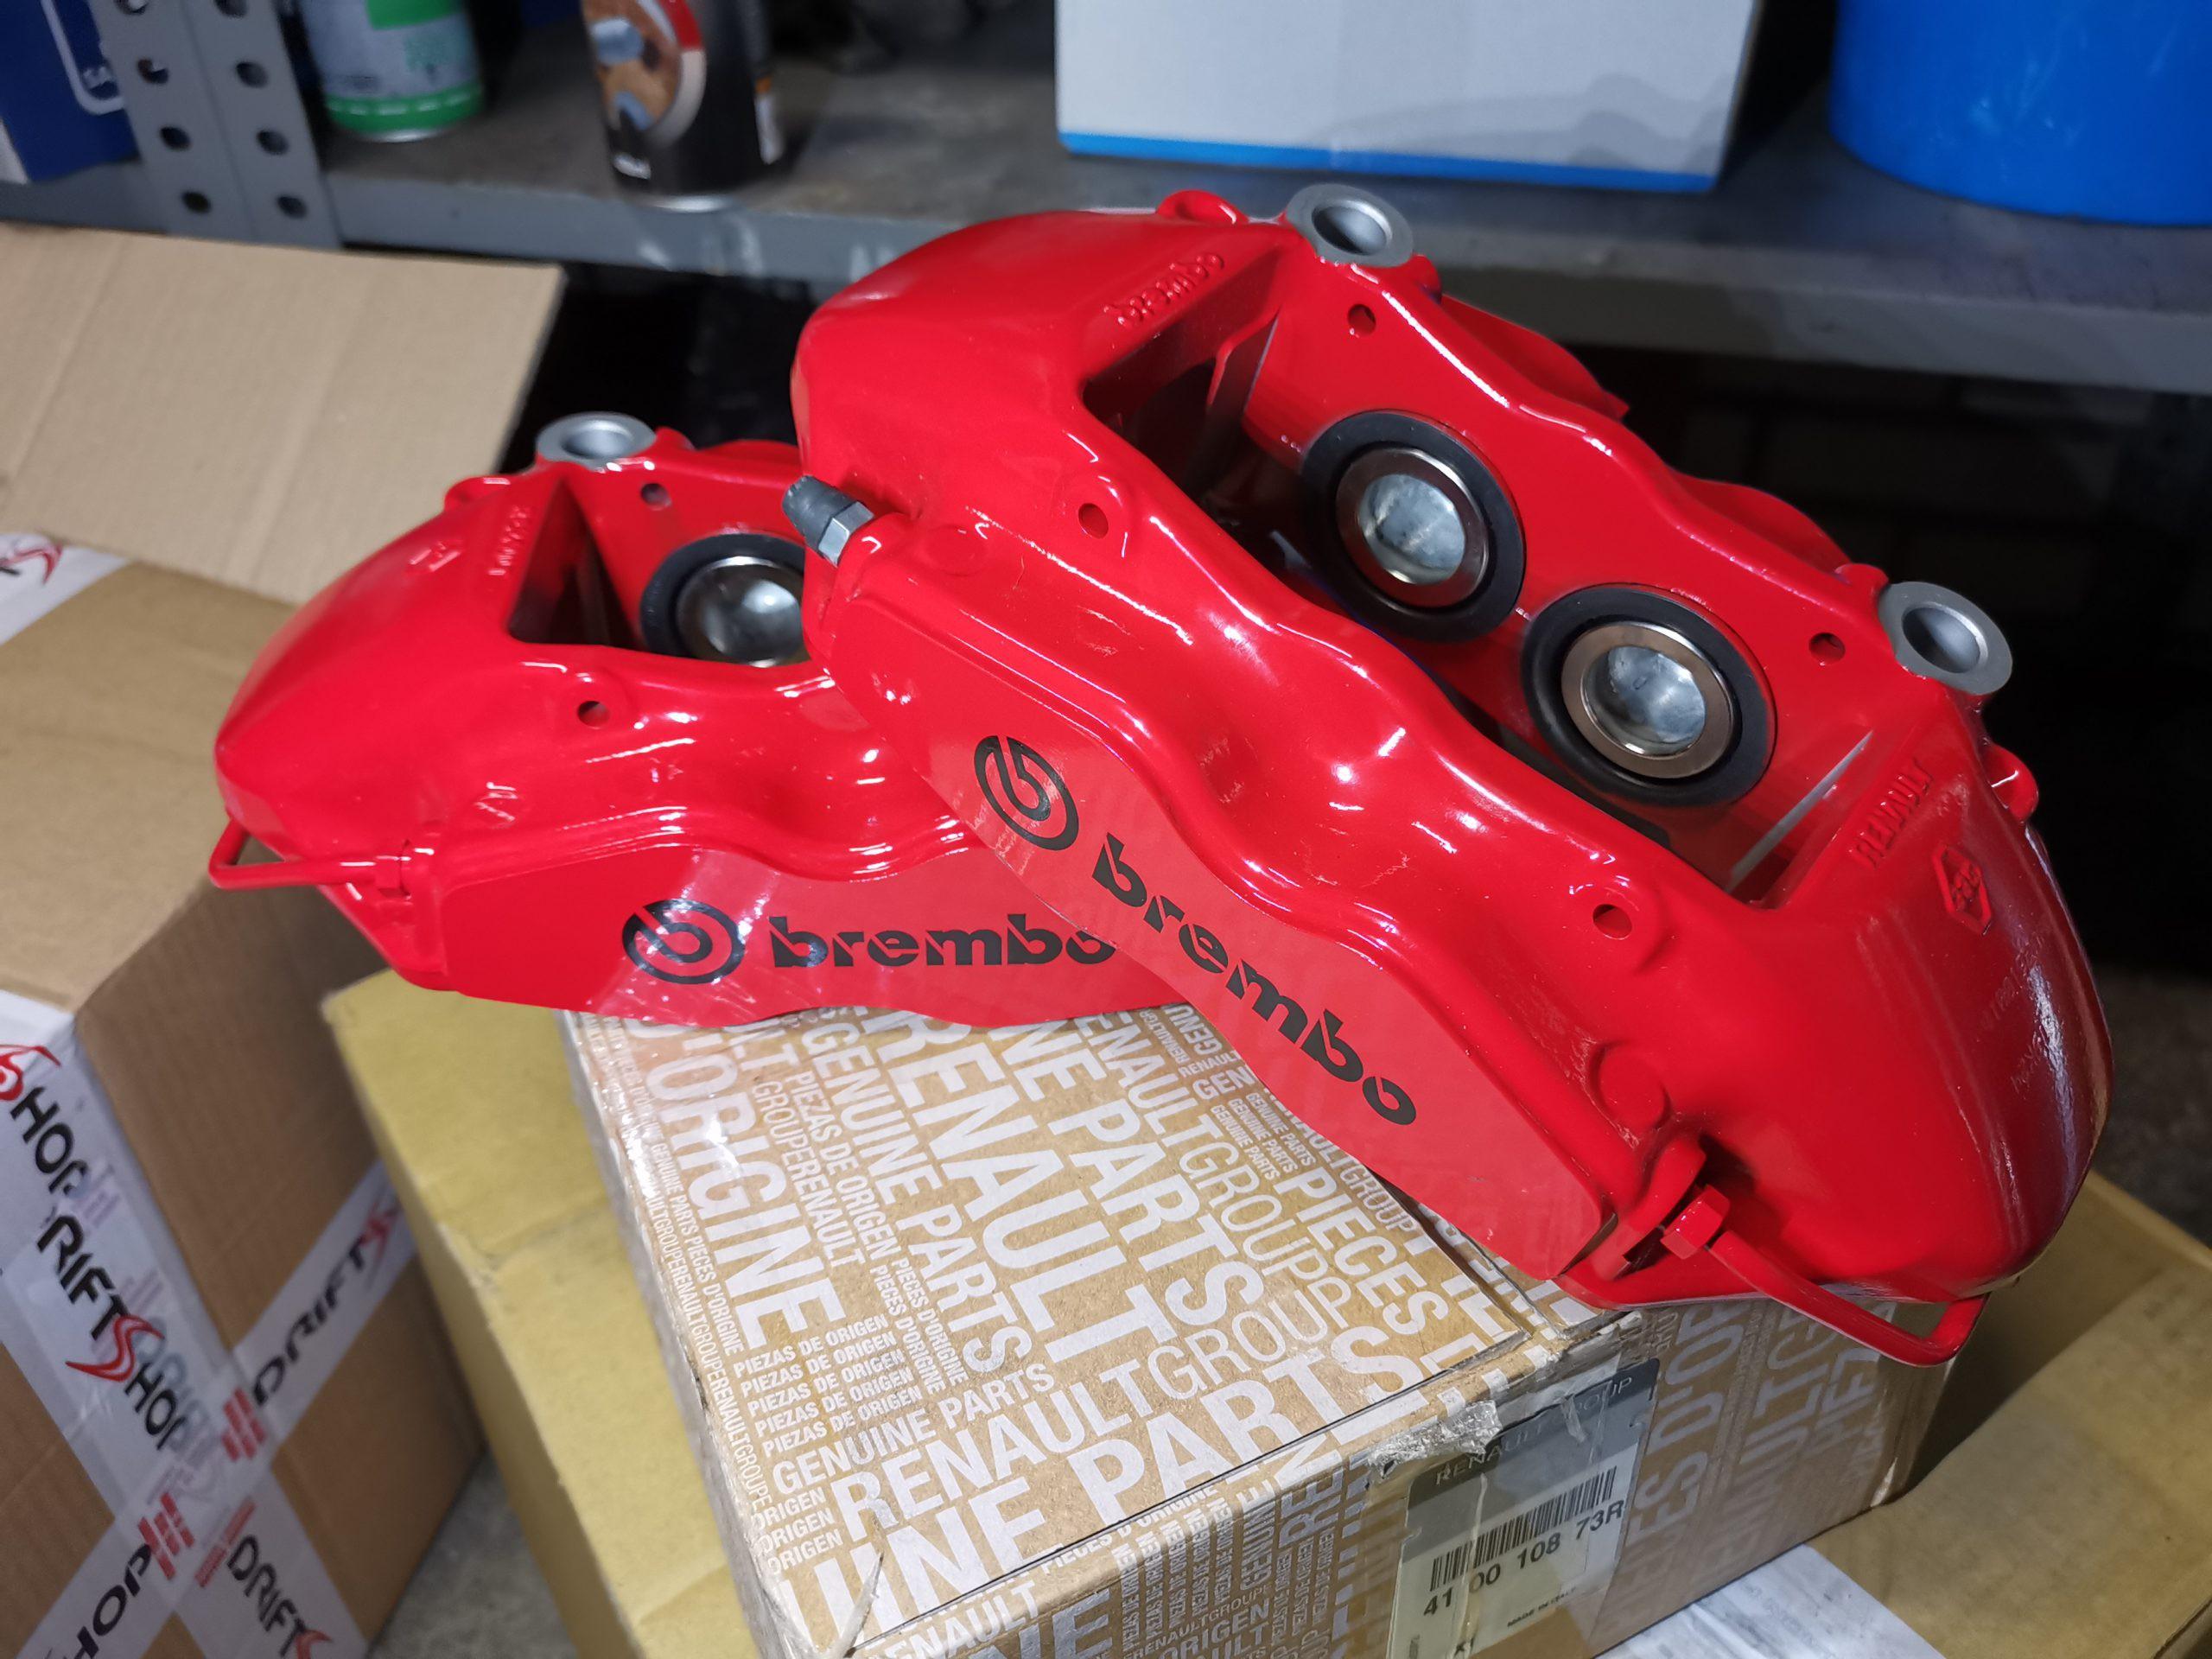 Parduodu Brembo suportus Renault Megane RSIII